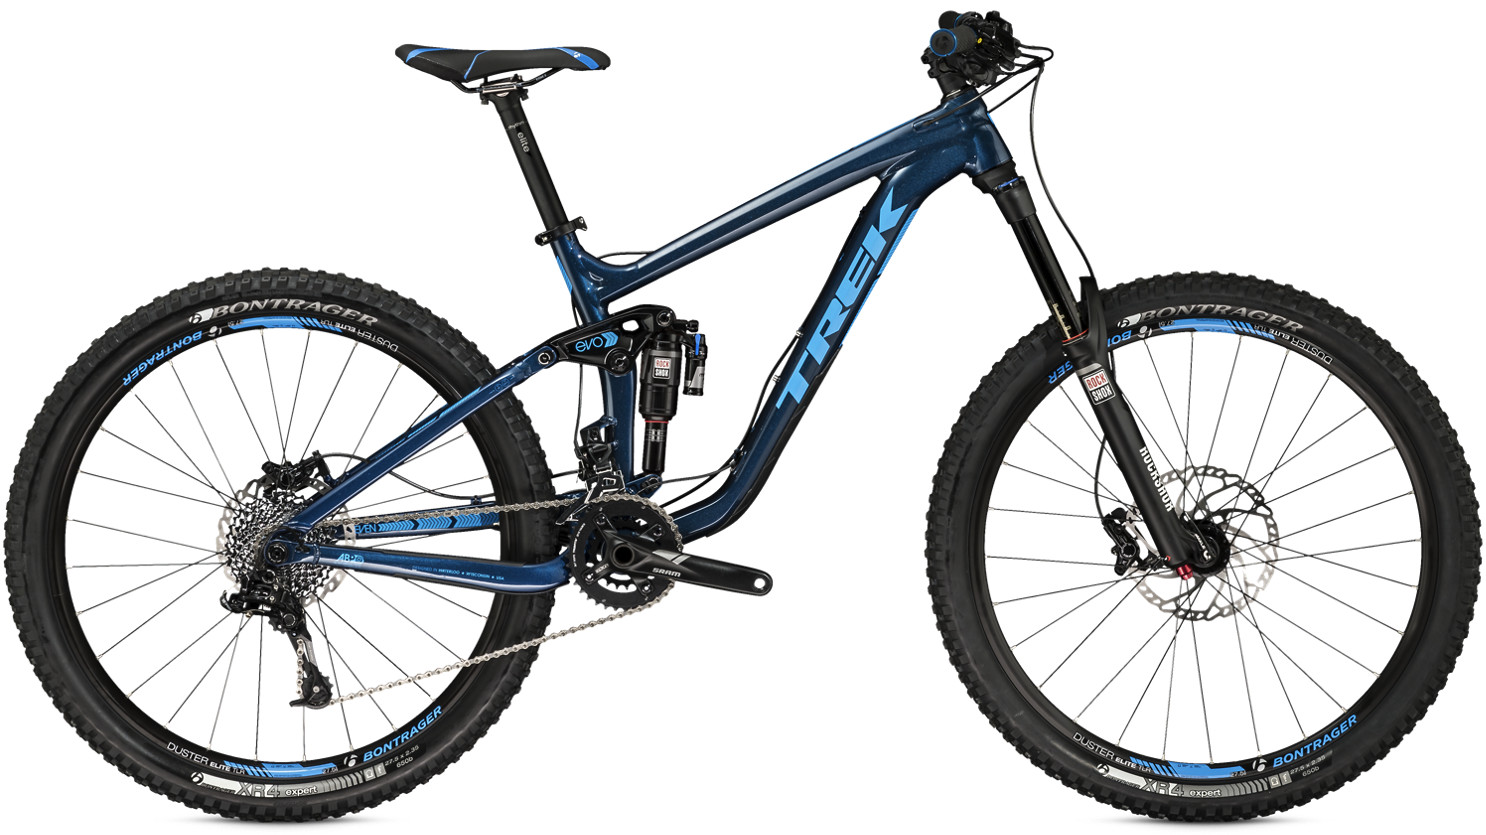 2015 trek slash 7 27 5 bike reviews comparisons specs. Black Bedroom Furniture Sets. Home Design Ideas